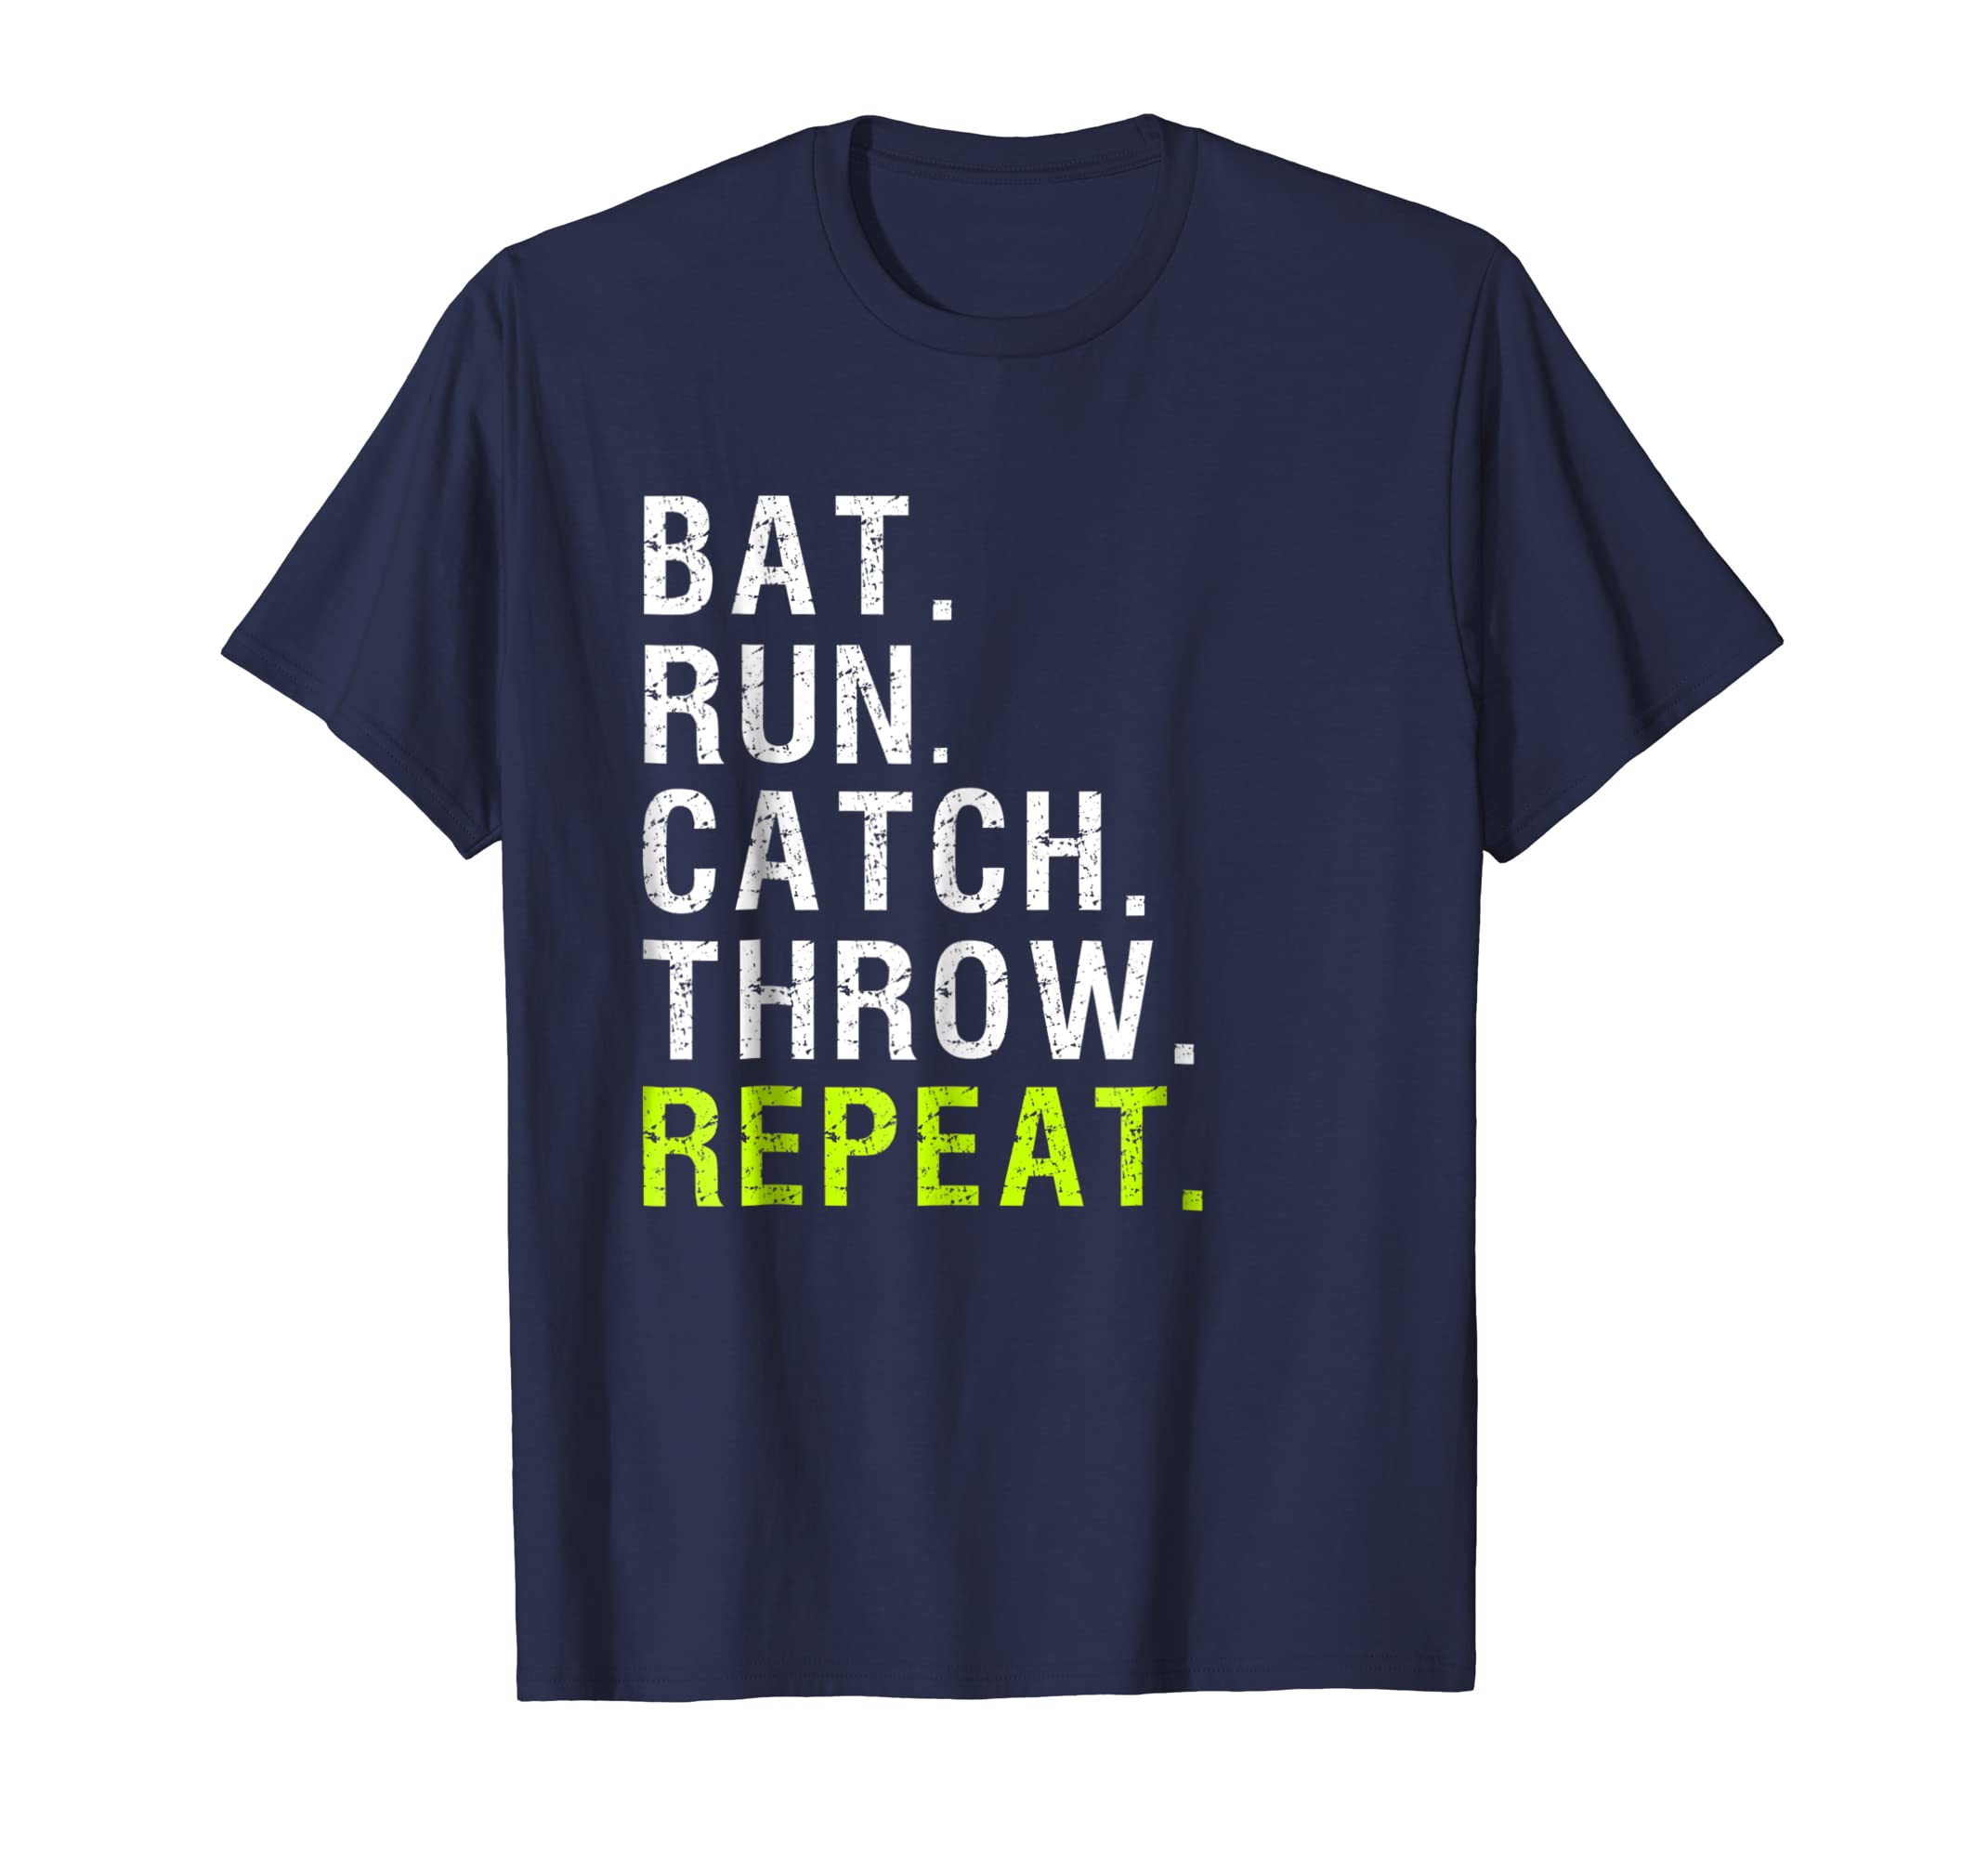 Baseball Player Gift Repeat T-shirt Bat Run Catch Throw-ln